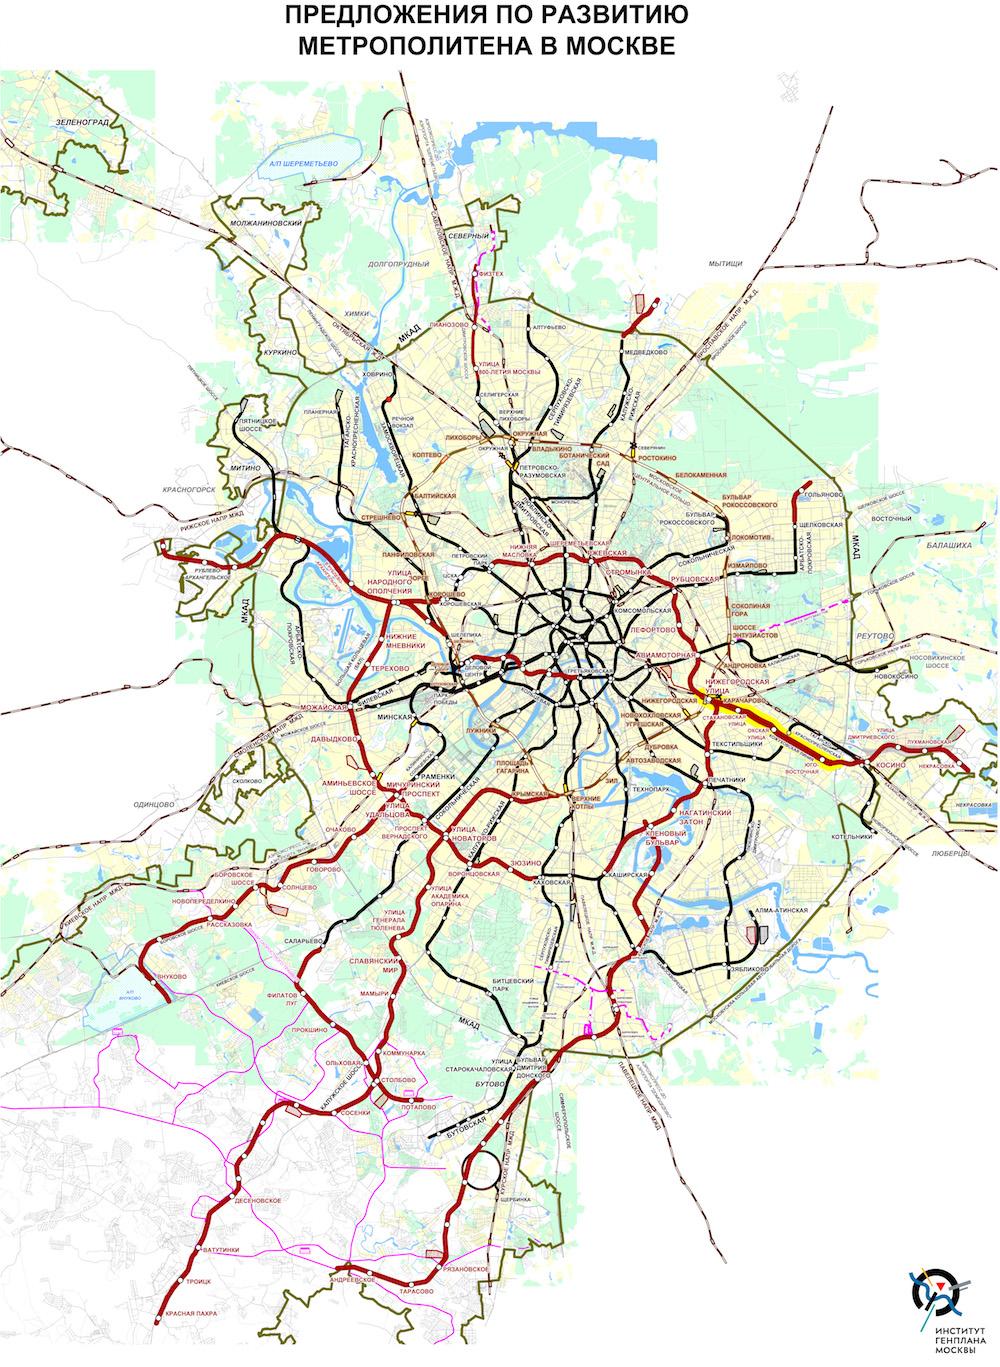 Moscow Metro Future Map (January 2019) © ГАУ «Институт Генплана Москвы», 2019